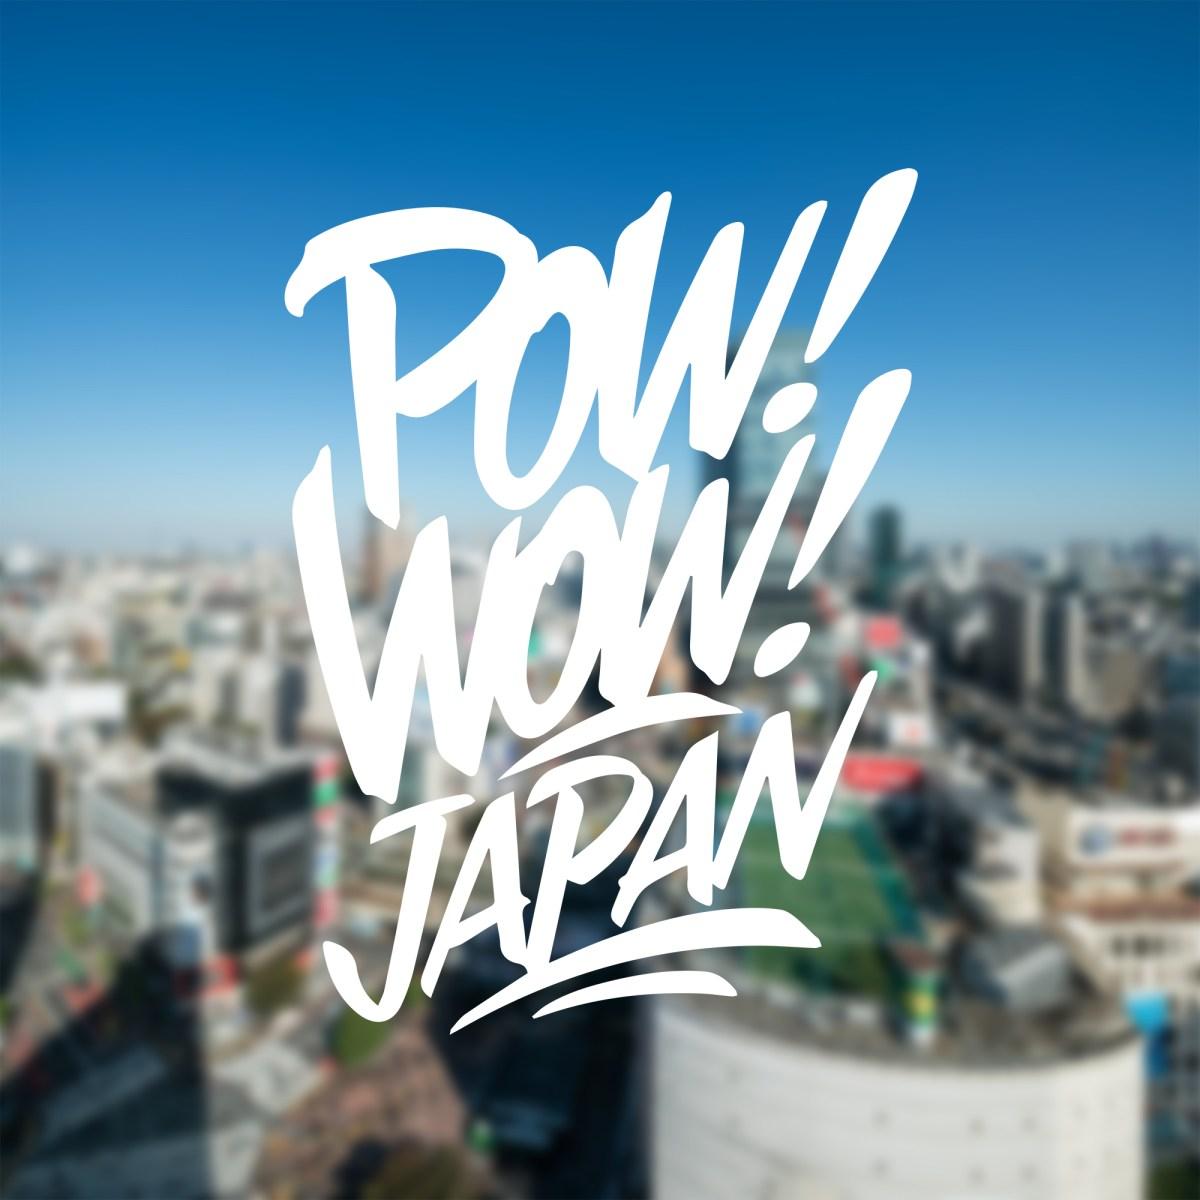 POW WOW JAPAN 2017 KOBE UPCOMING EVENT